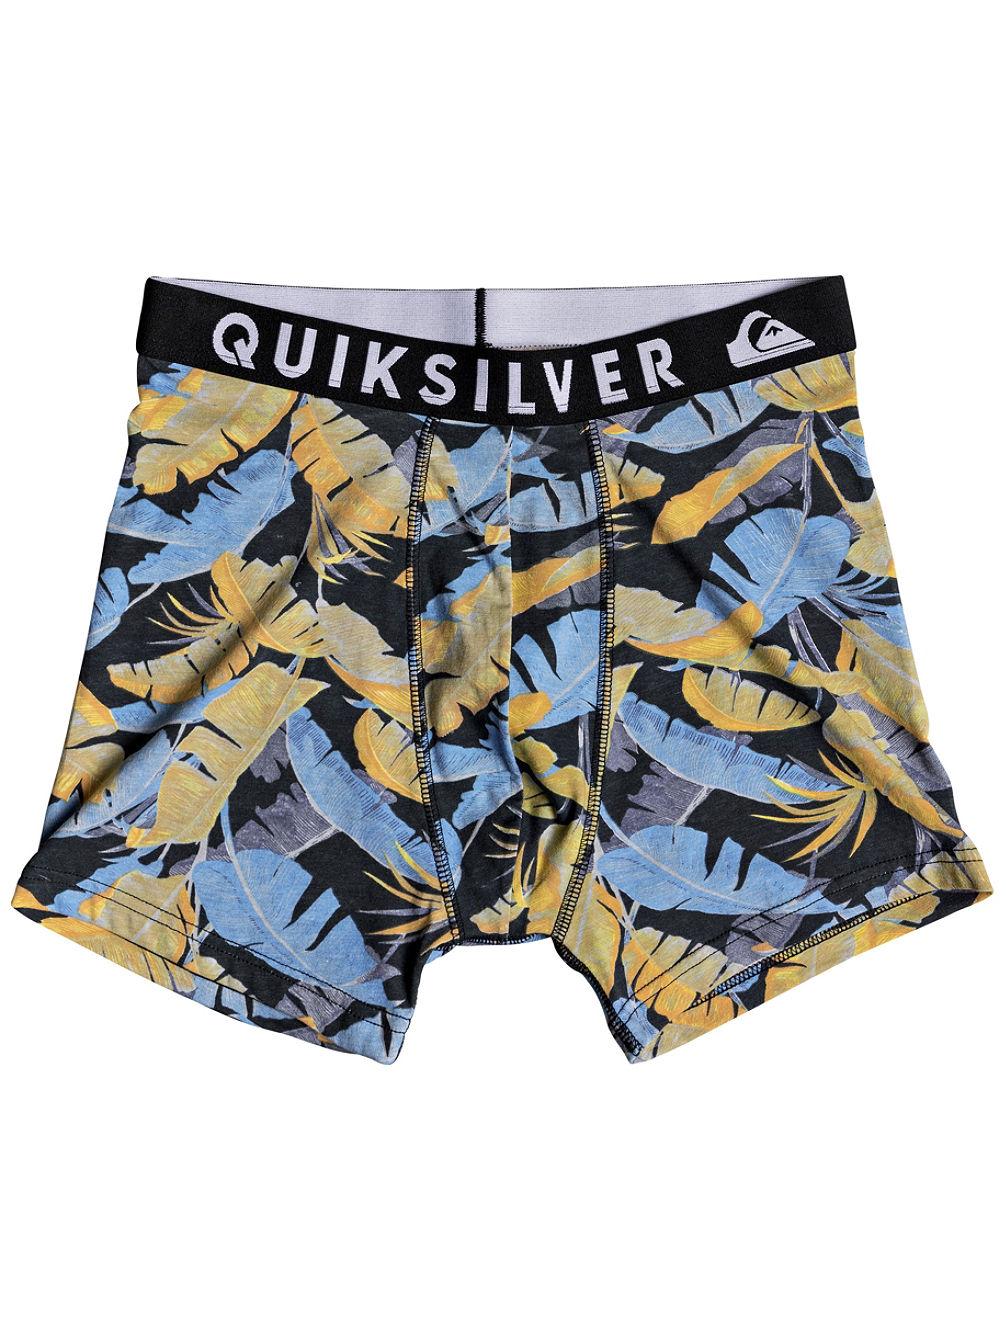 quiksilver poster boxershorts online kaufen bei blue. Black Bedroom Furniture Sets. Home Design Ideas